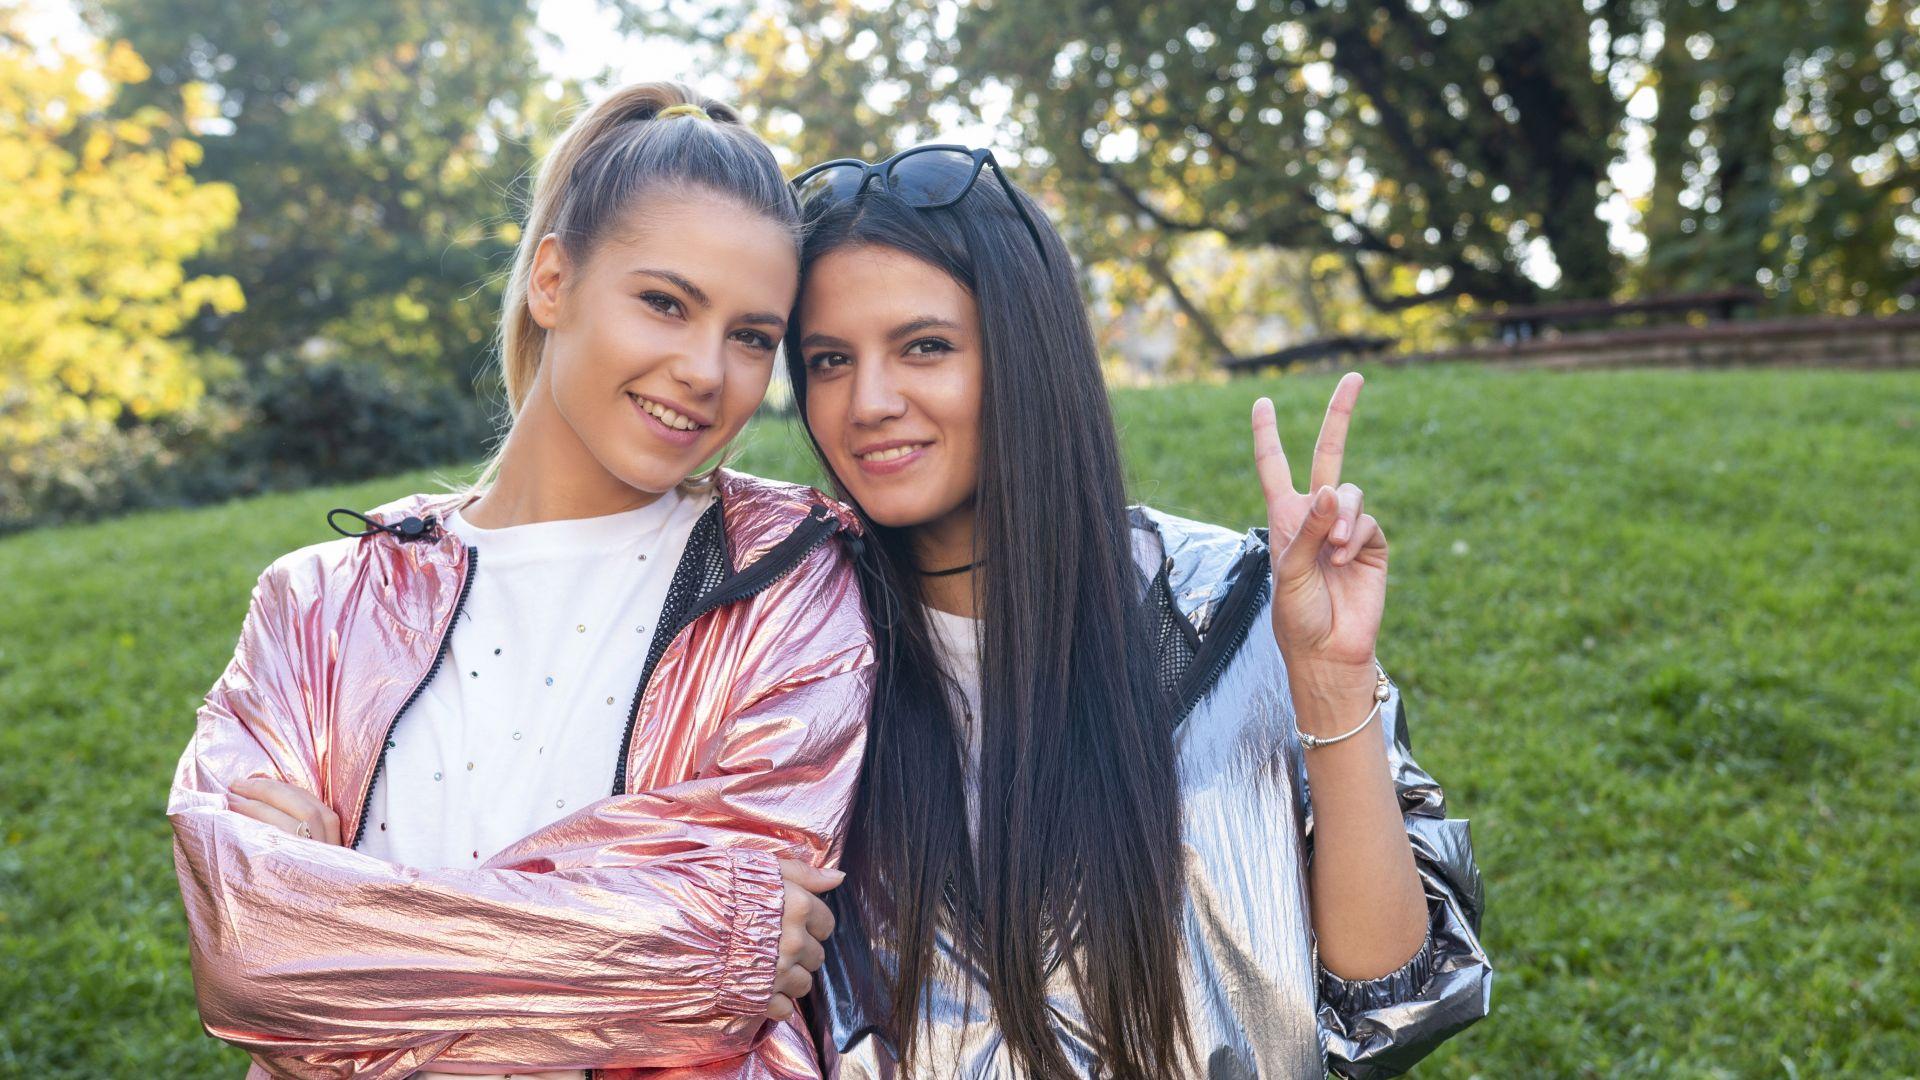 #5dayschallenge: Ива и Велислава Костадинови с рецепта за красота и добро настроение